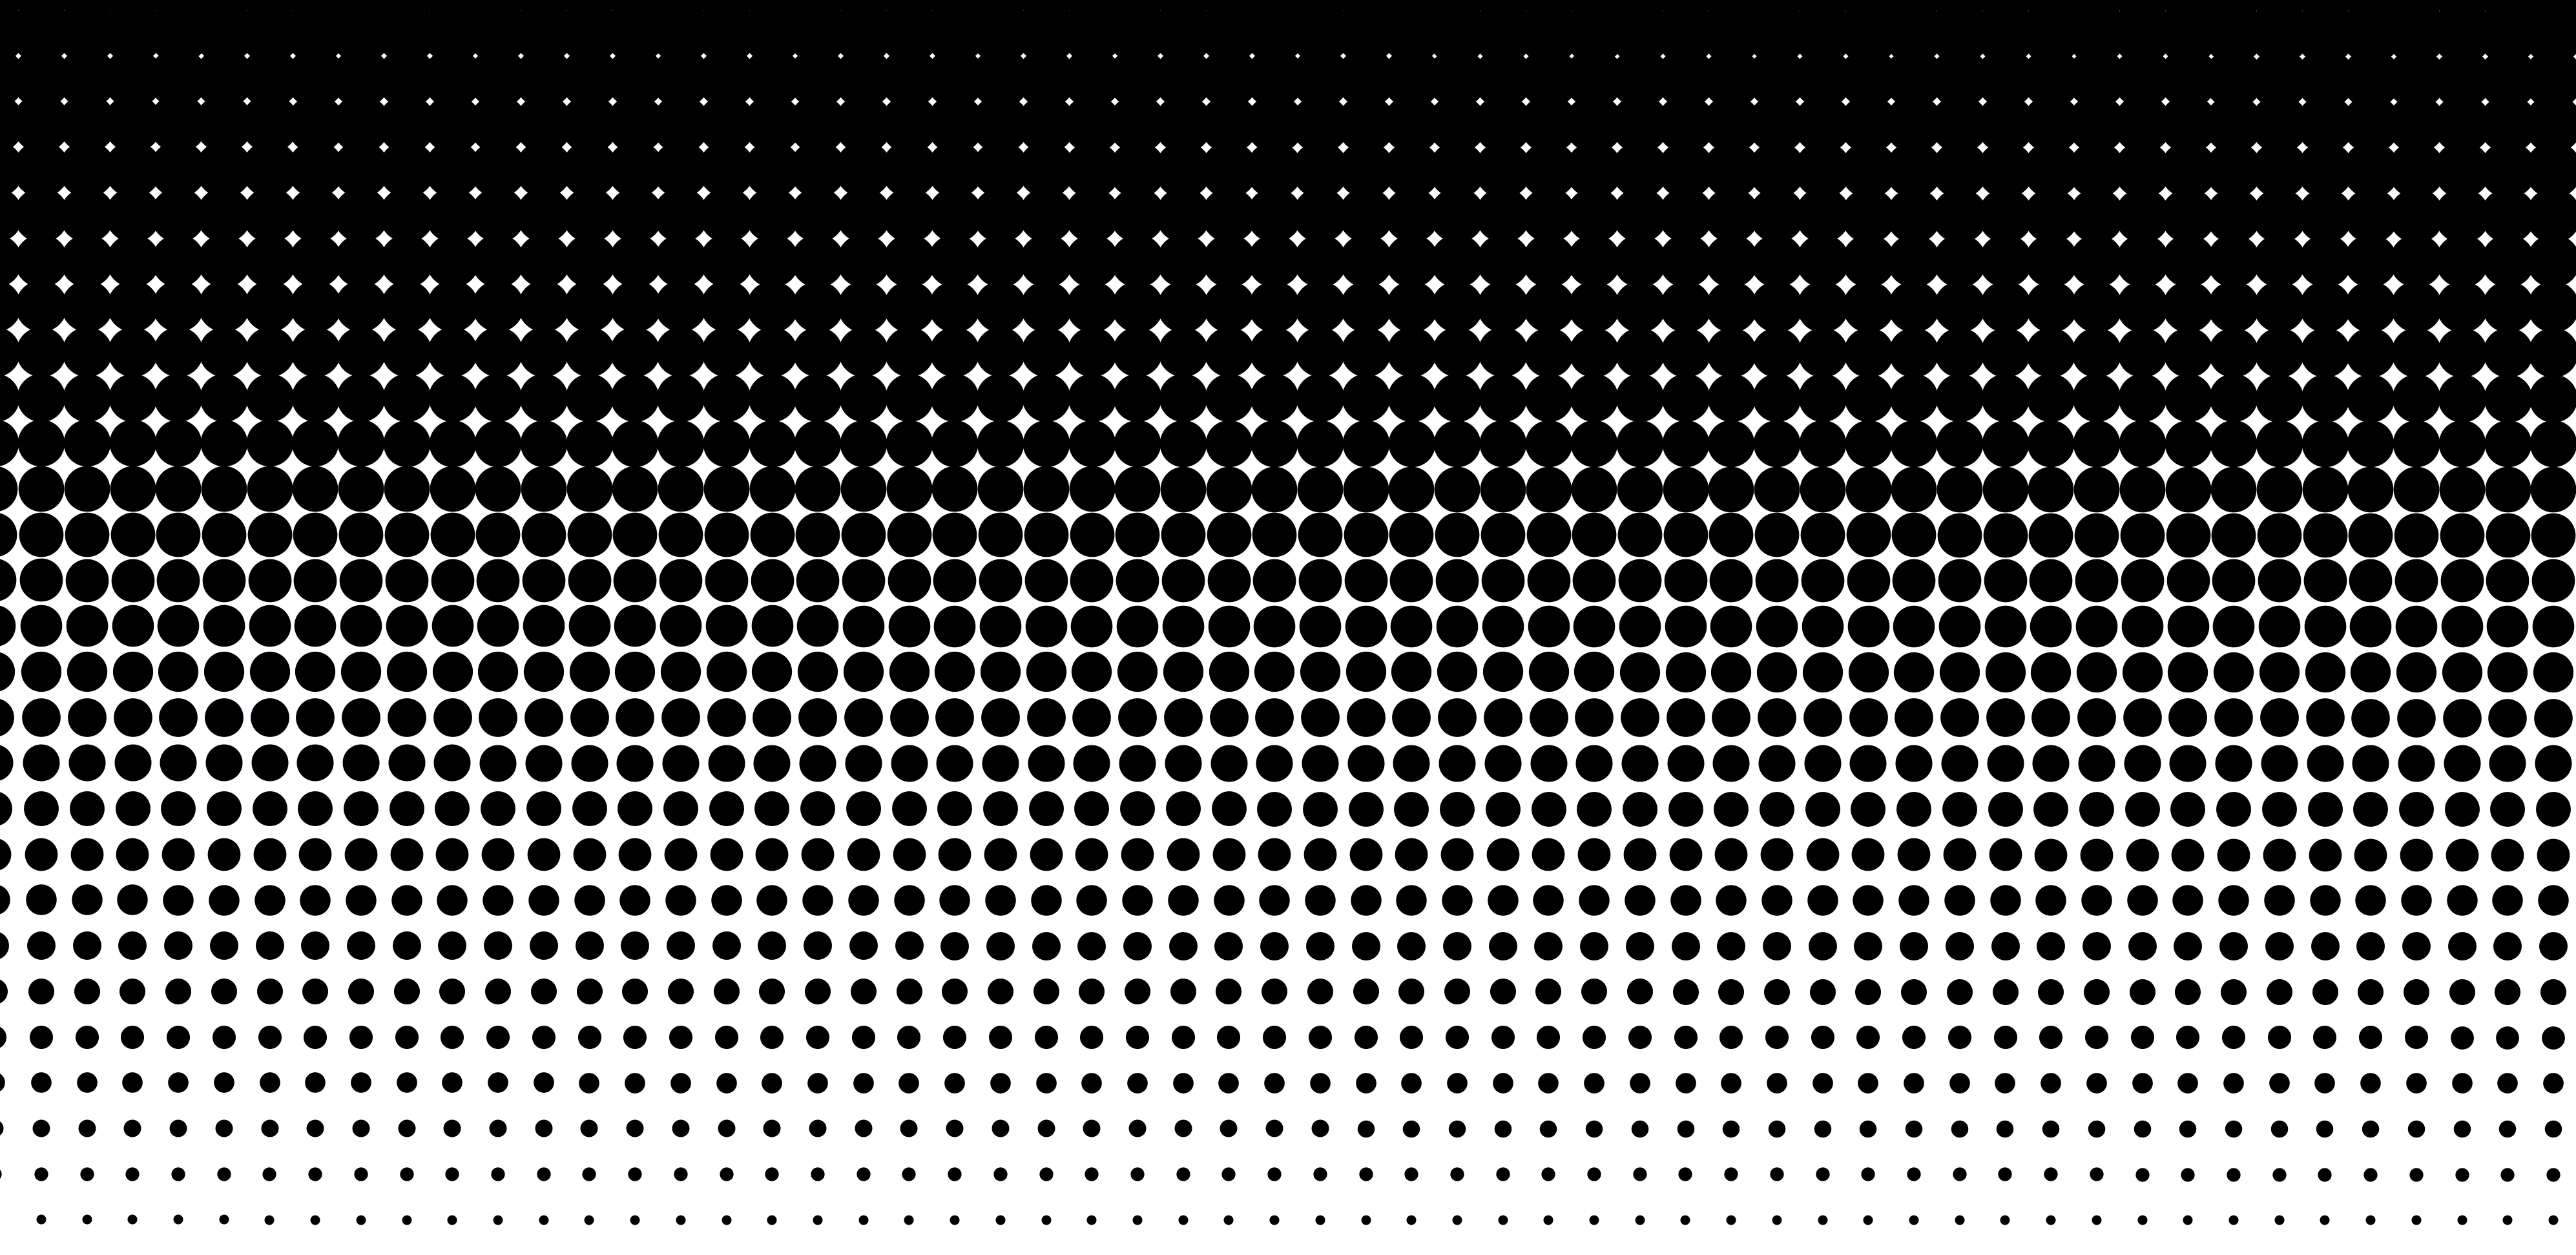 Pin By Damienart On Balck White Halftone Pattern Halftone Black And White Background